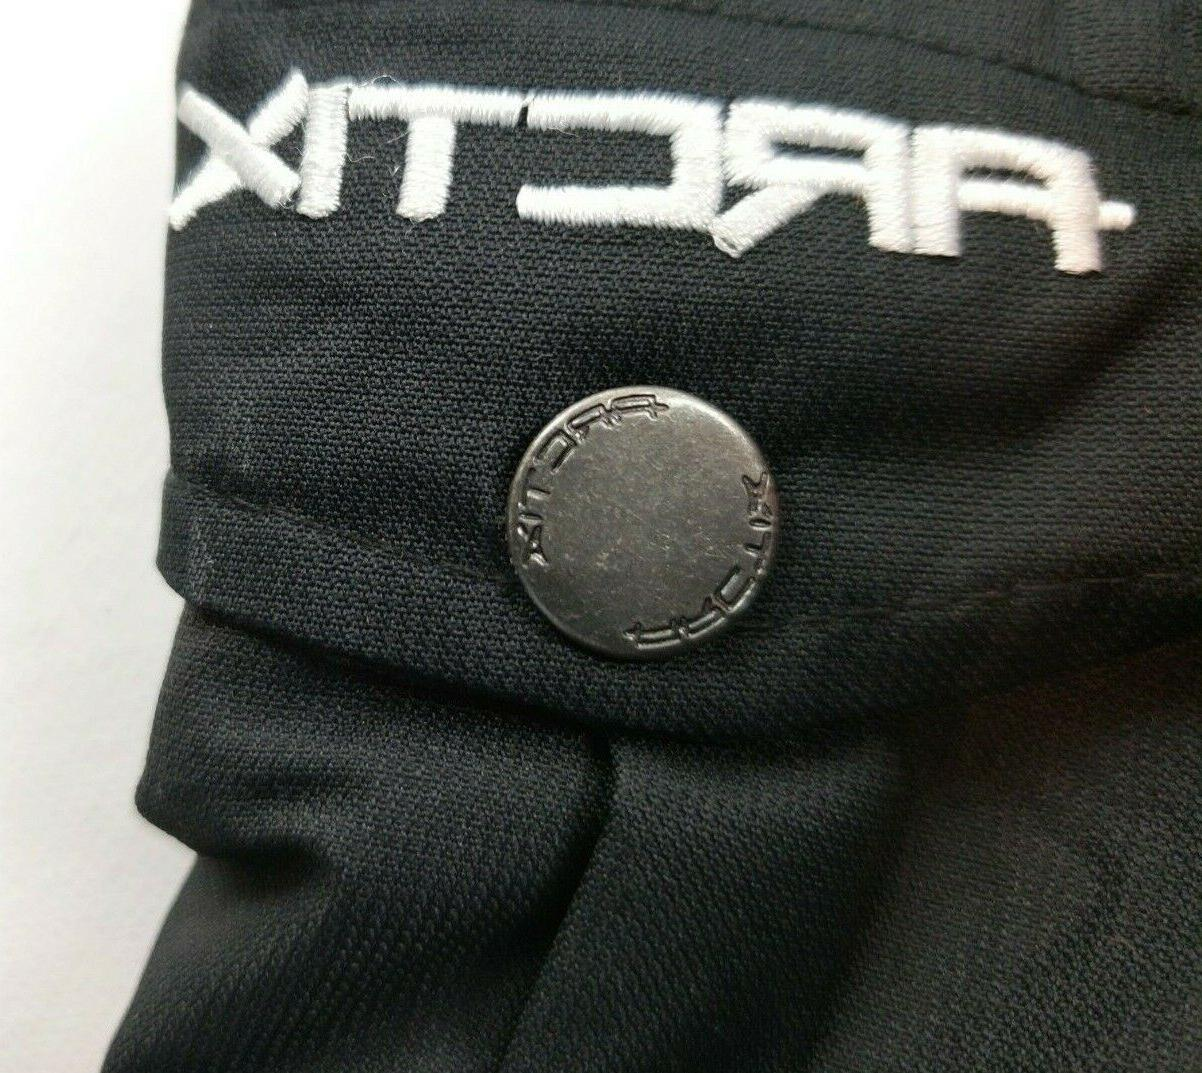 Arctix Ski X-Large, NWT